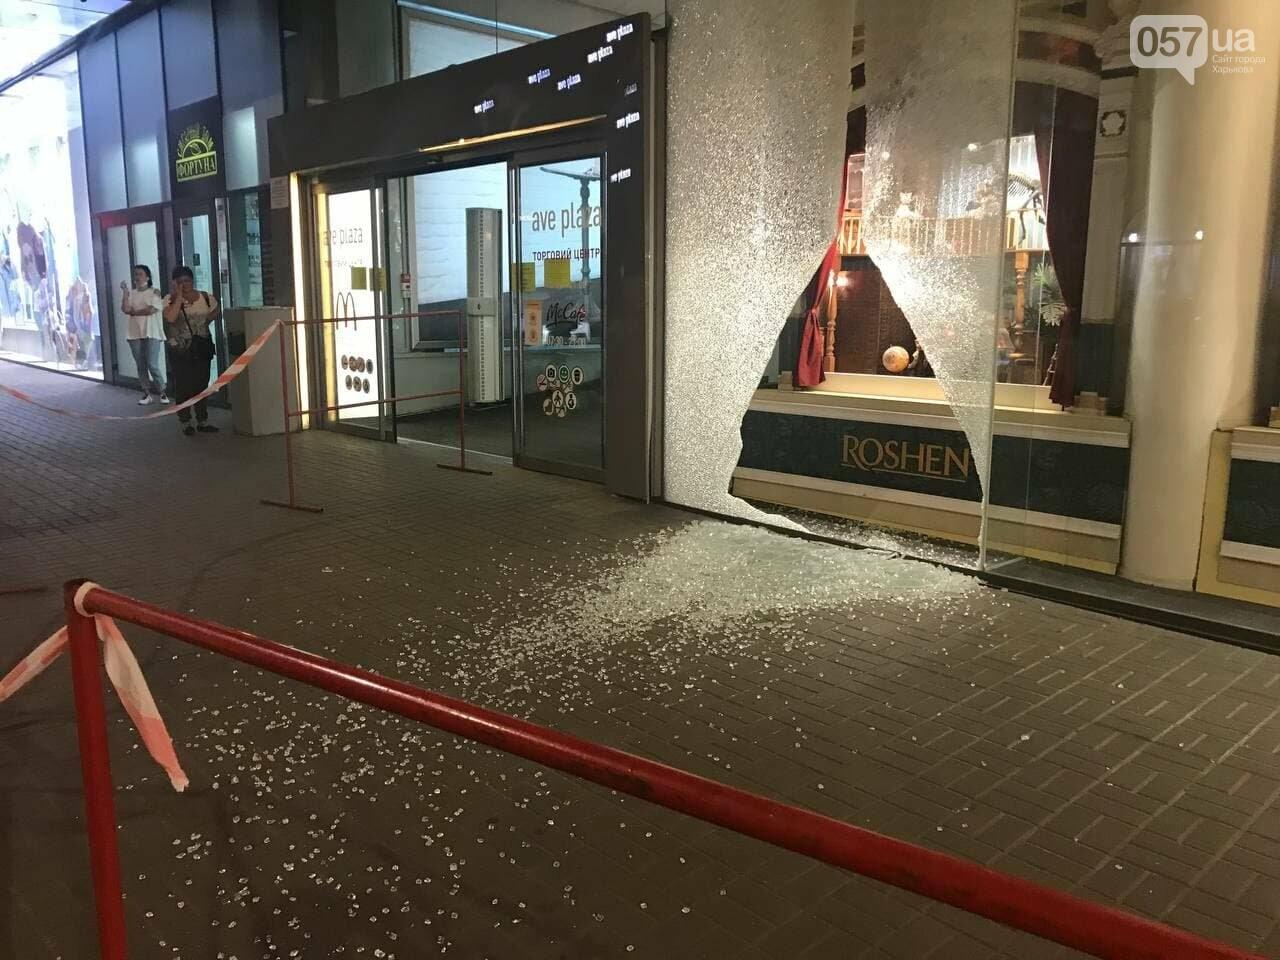 В центре Харькова неизвестные разгромили витрину ТЦ, - ФОТО, фото-1